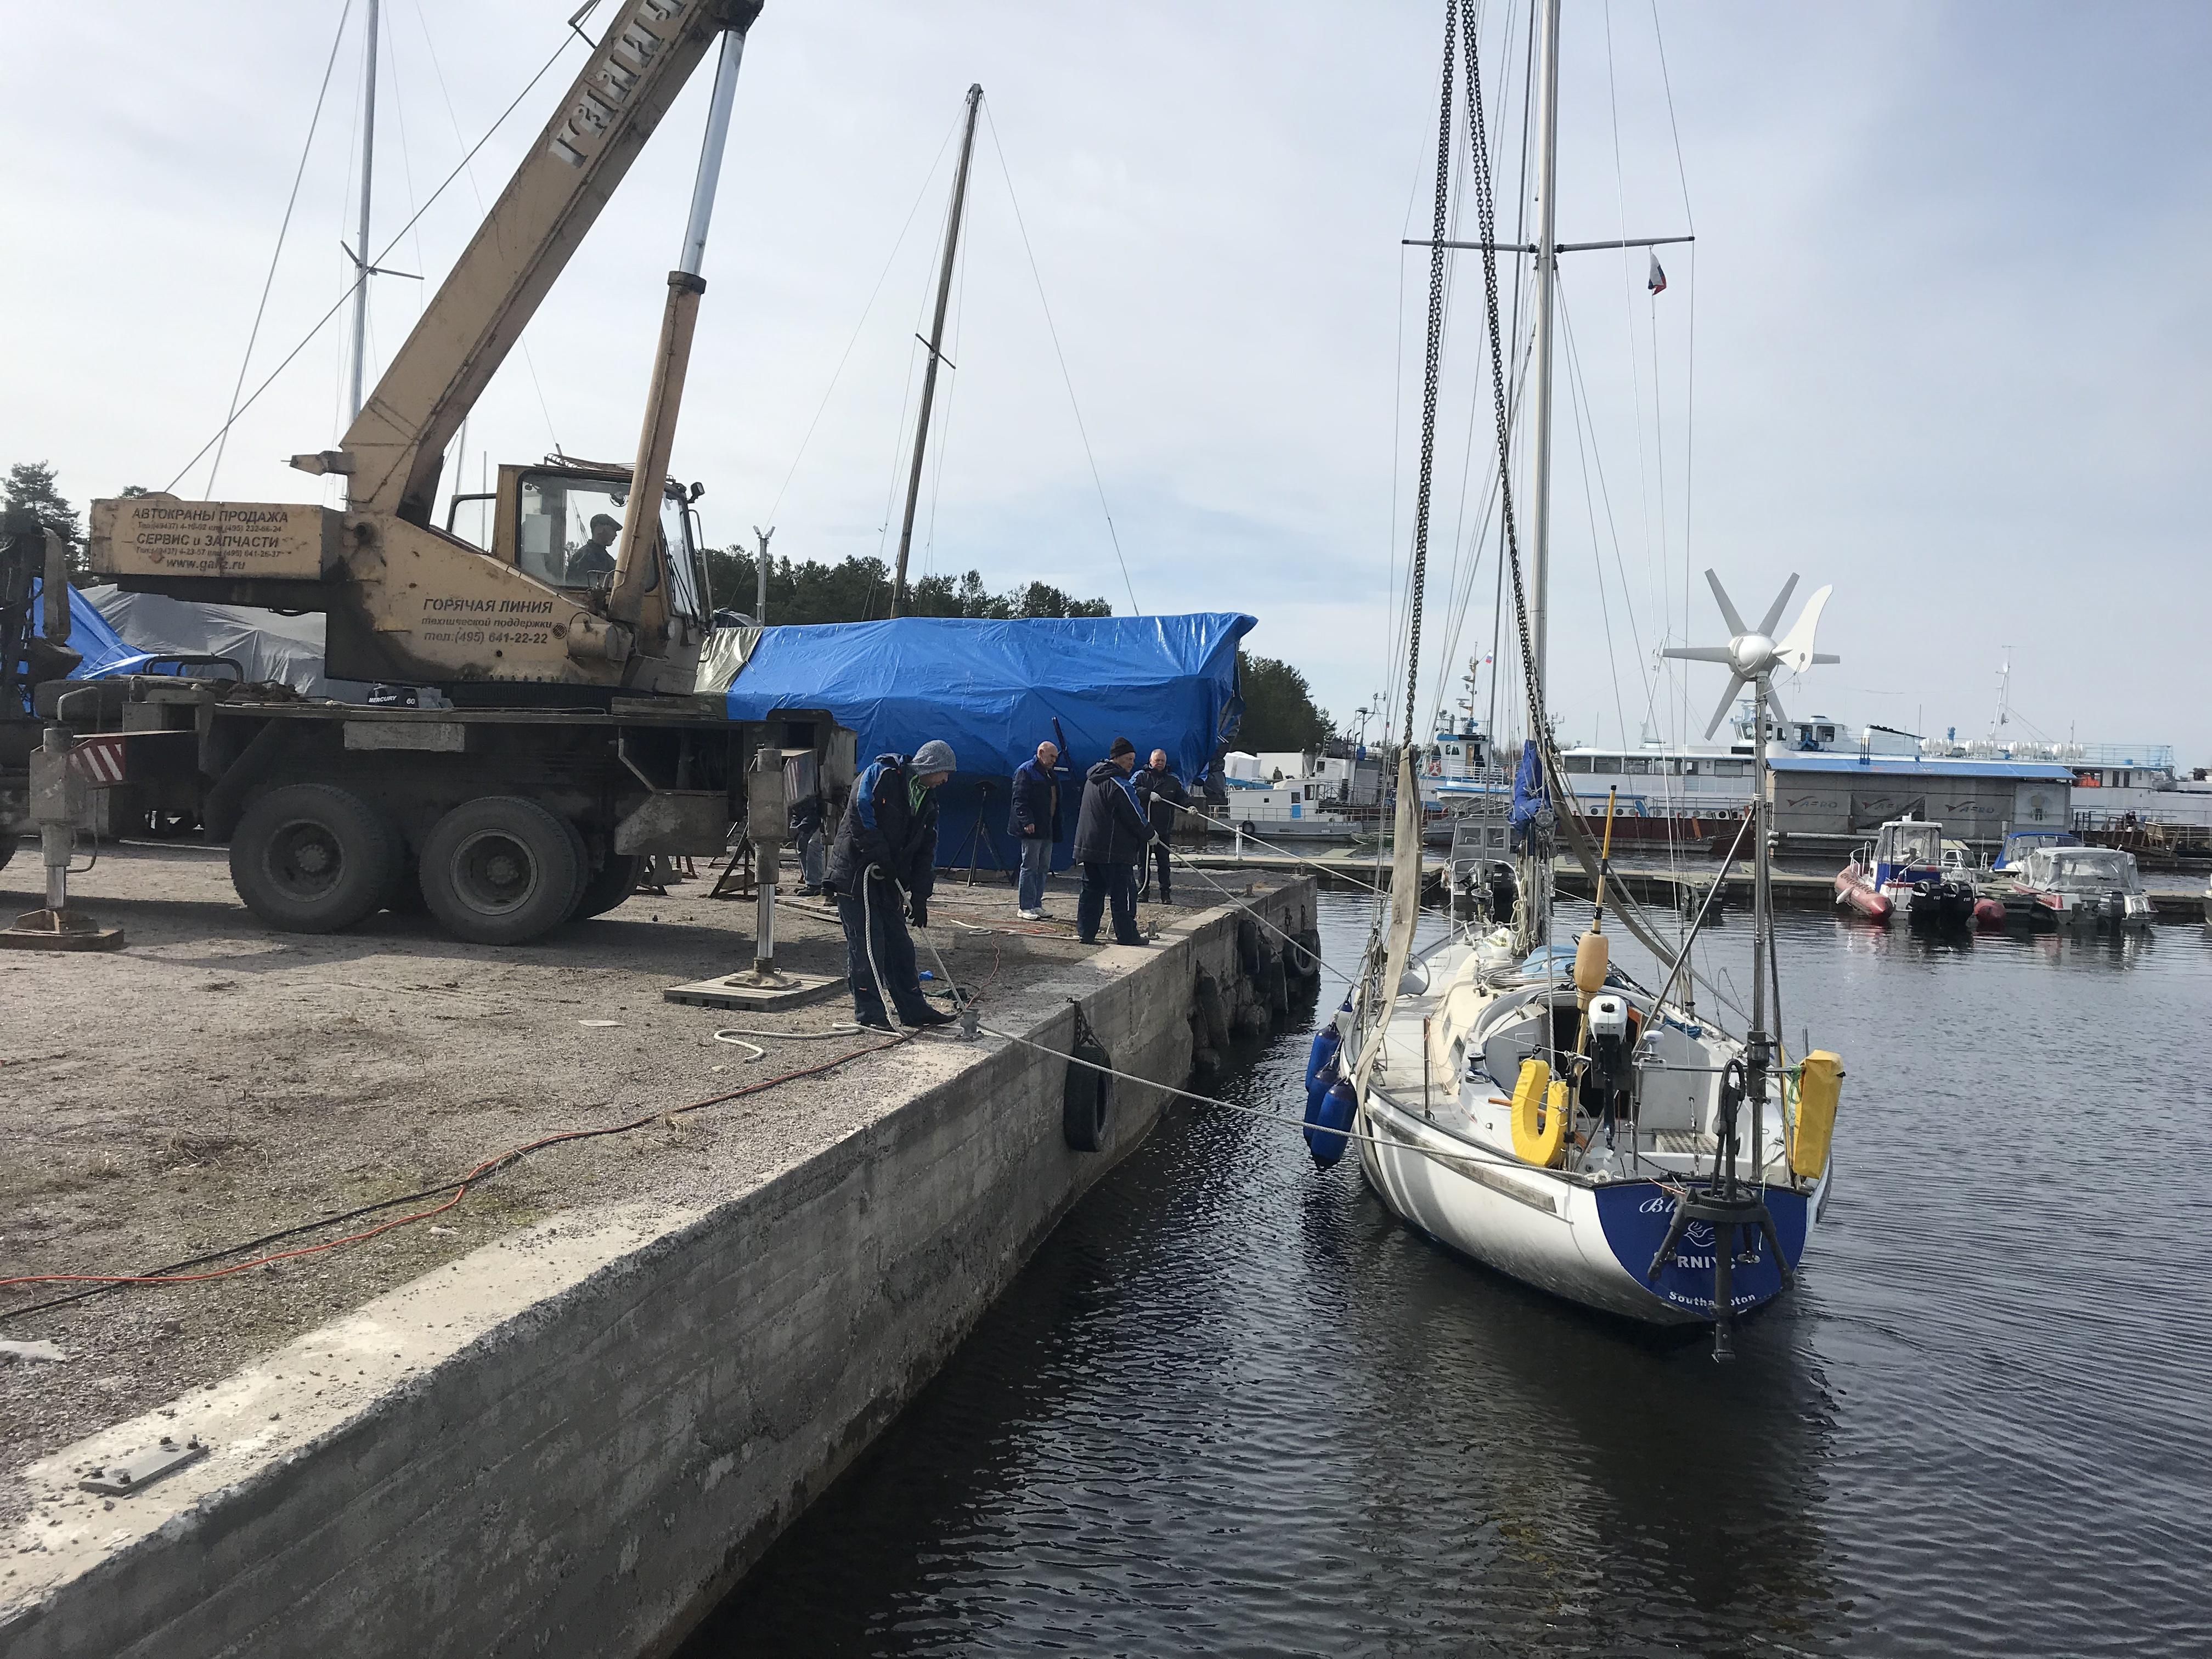 Crane And Boat